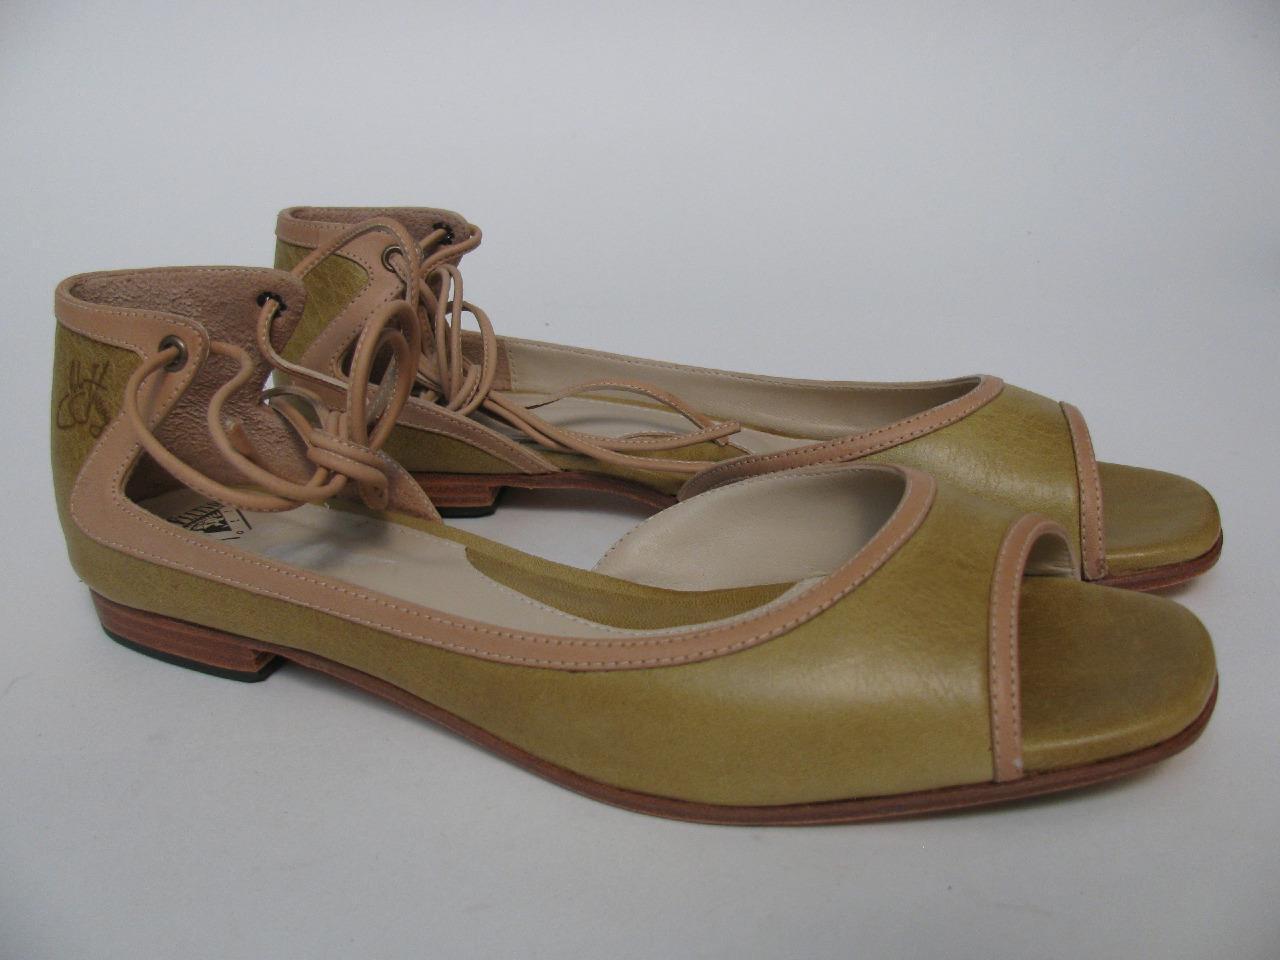 JOHN FLUEVOG RIVER GREEN LEATHER OPEN TOE ANKLE SANDALS9 TIE BALLET FLAT Schuhe SANDALS9 ANKLE f8a2cf